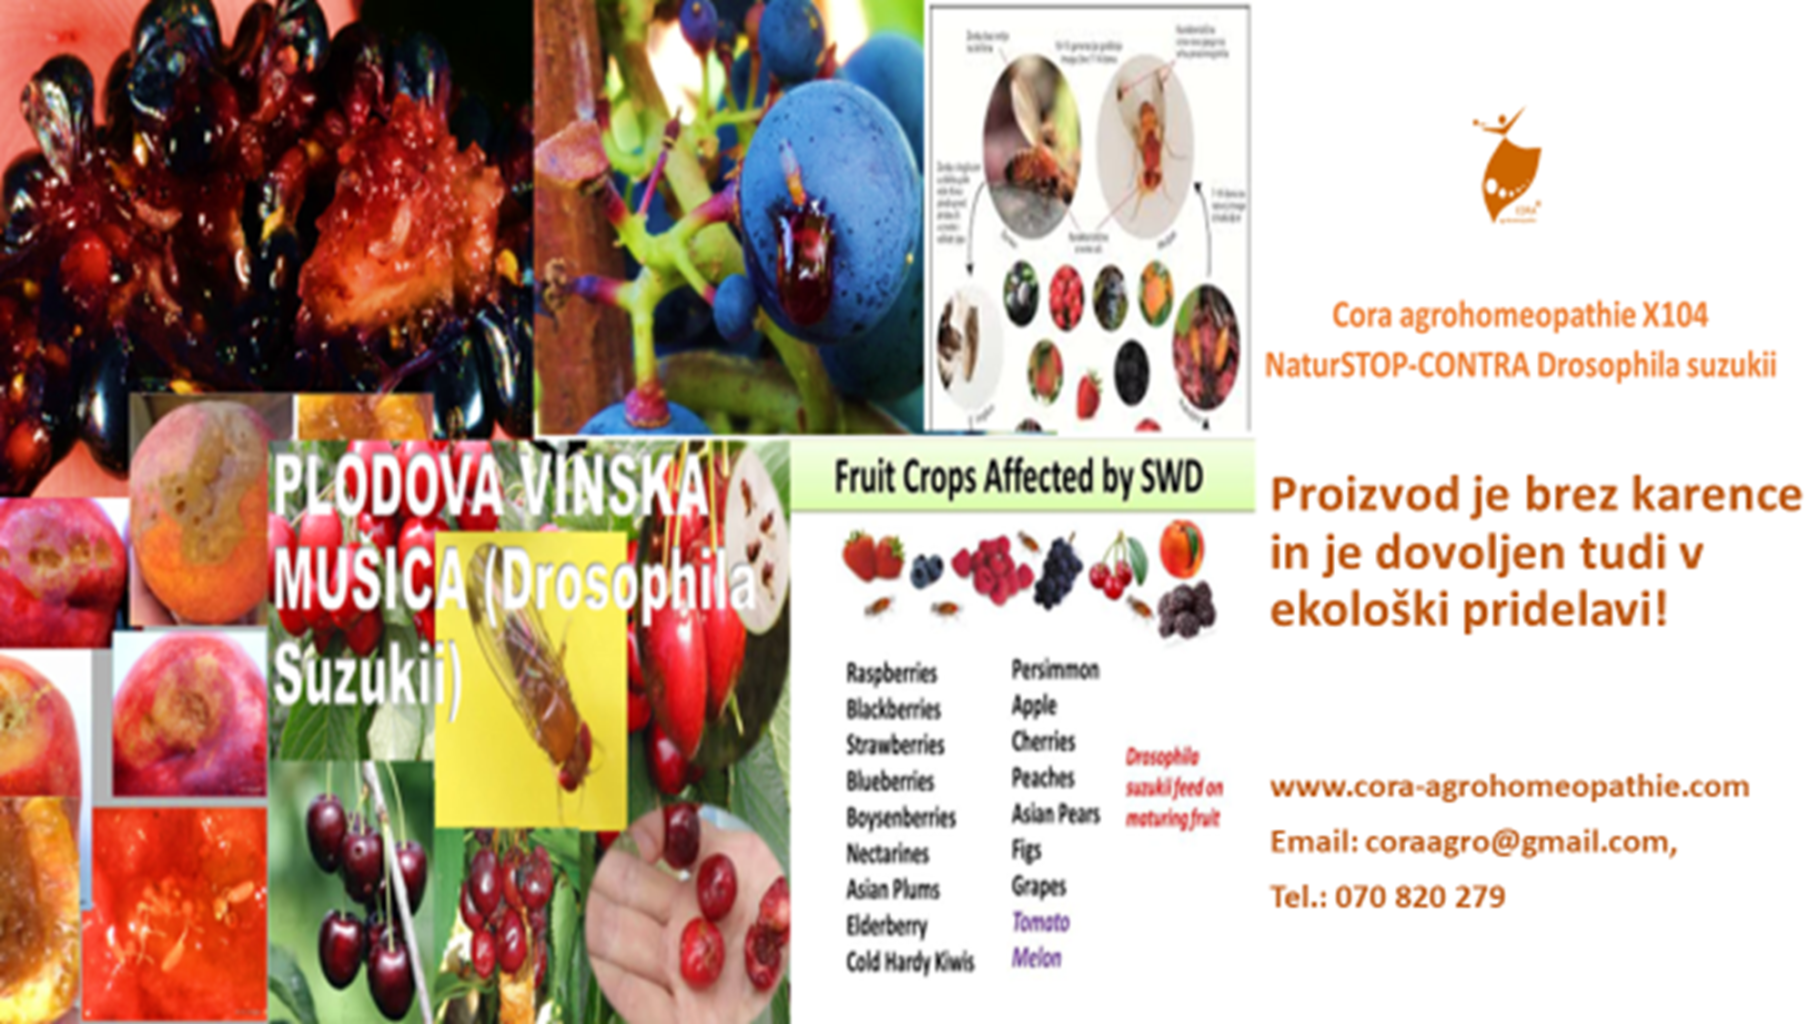 NARAVNI STOP PLODOVA VINSKA MUŠICA Cora agrohomeopathie X104 NaturSTOP CONTRA Drosophila suzukii 1820x1024 - EXCELLENT NATURAL & SUSTAINABLE SOLUTION to prevent problems with Drosophila suzukii